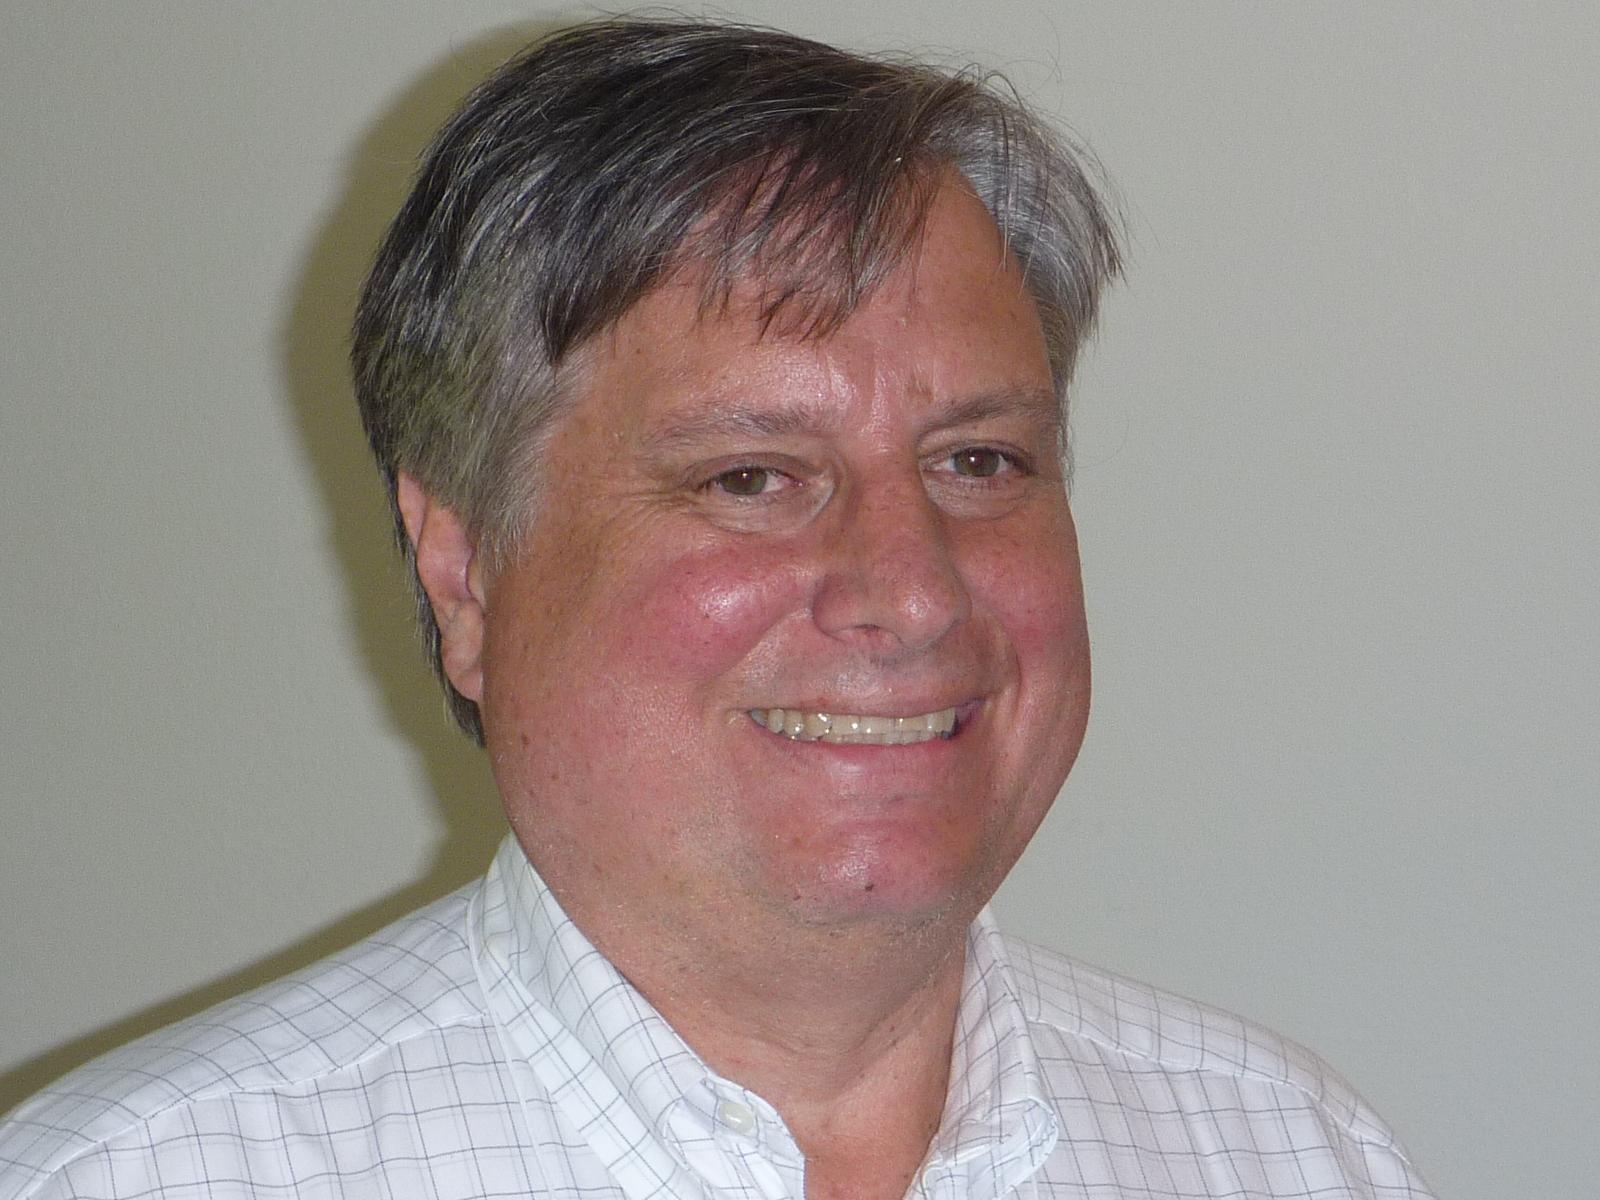 Martin K. Ettington